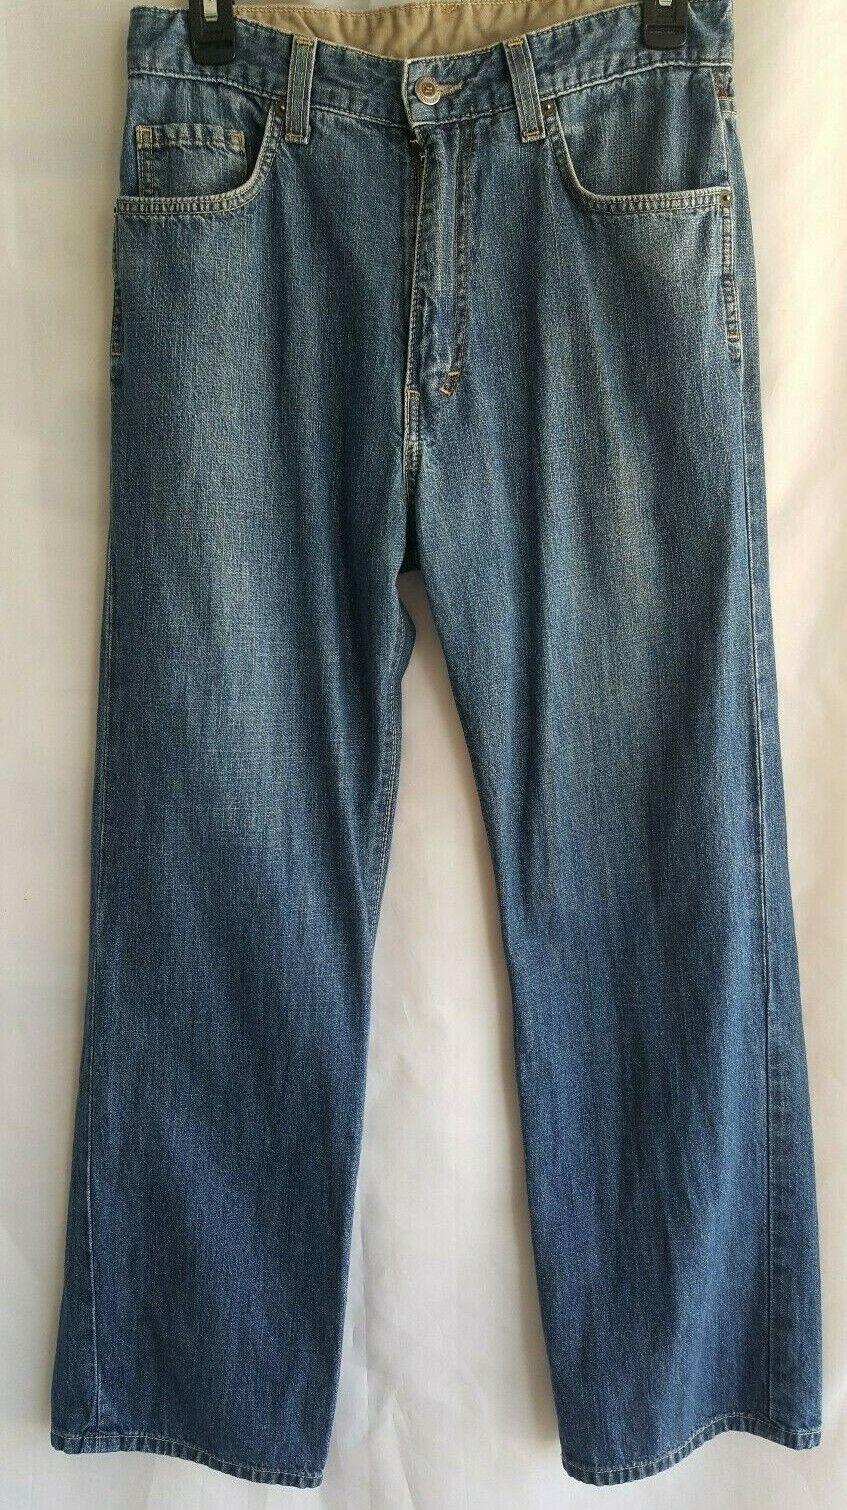 Men s HURLEY INTERNATIONAL IDENTITY JEAN MADE IN USA Denim Jeans Sz 30 30x27  - $12.95